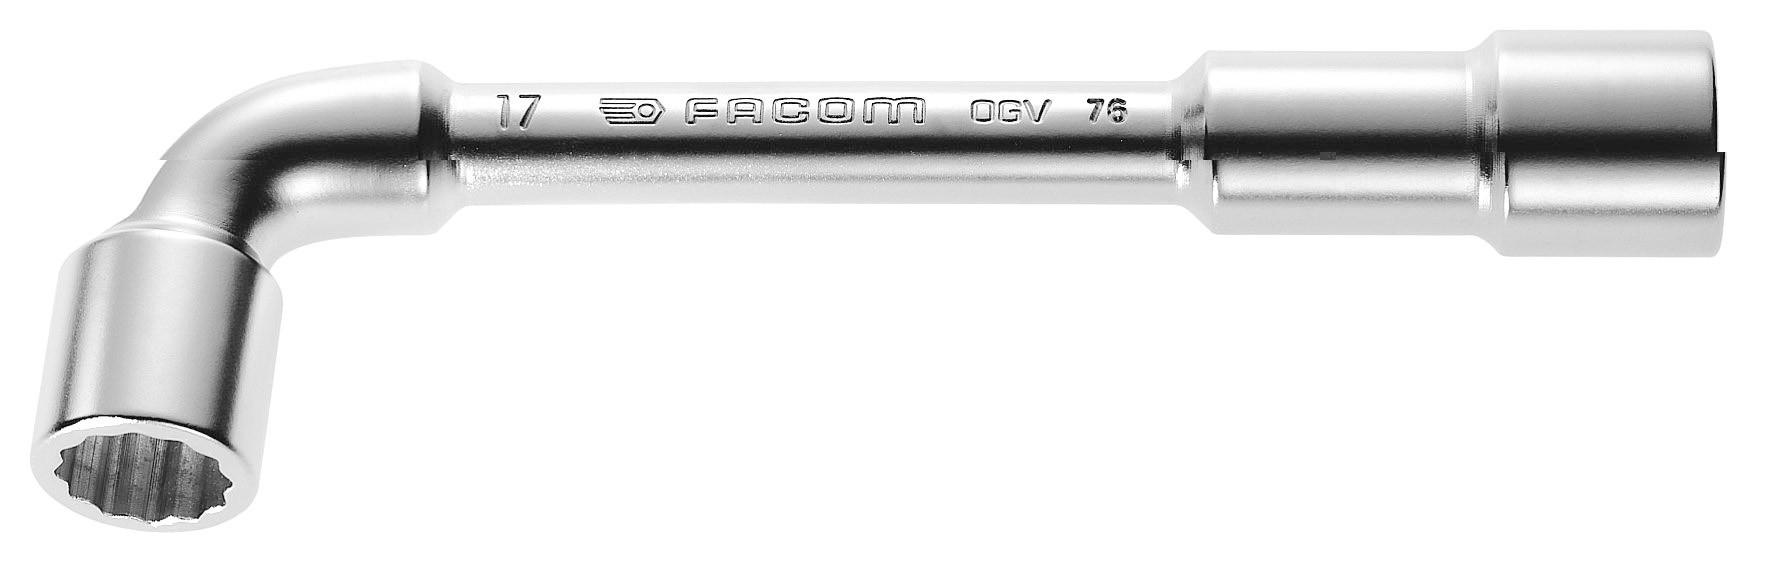 cl pipe 12 pans 20mm facom outillage main. Black Bedroom Furniture Sets. Home Design Ideas